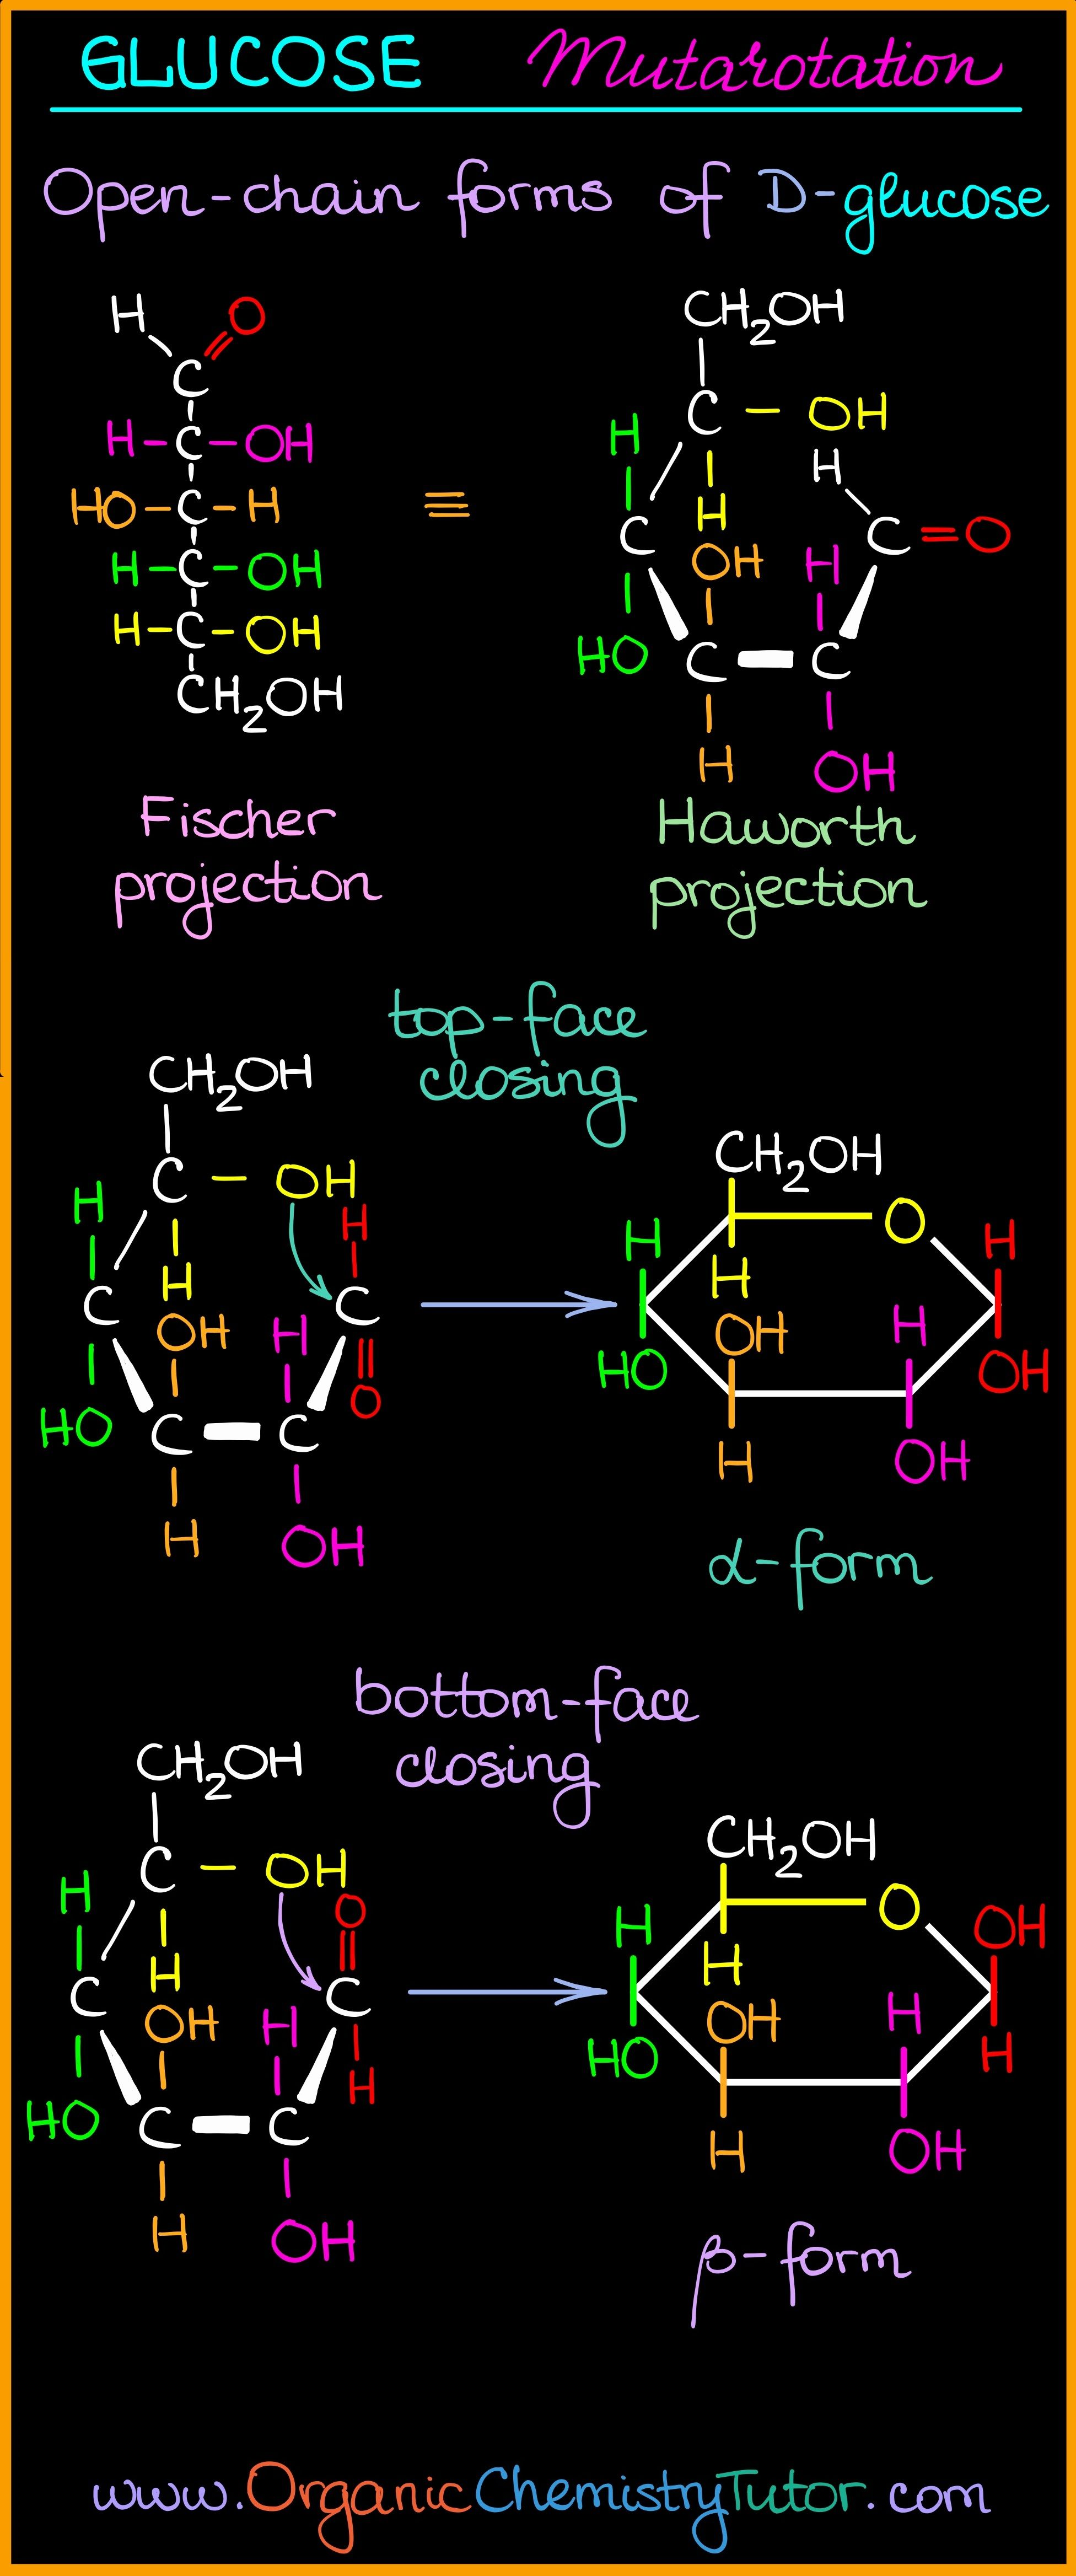 Mutarotation Of Glucose Organicchemistry Ochem Orgo Ochemtutor Cheatsheet Chemis Organic Chemistry Organic Chemistry Study Organic Chemistry Reactions What is addition elimination reactions